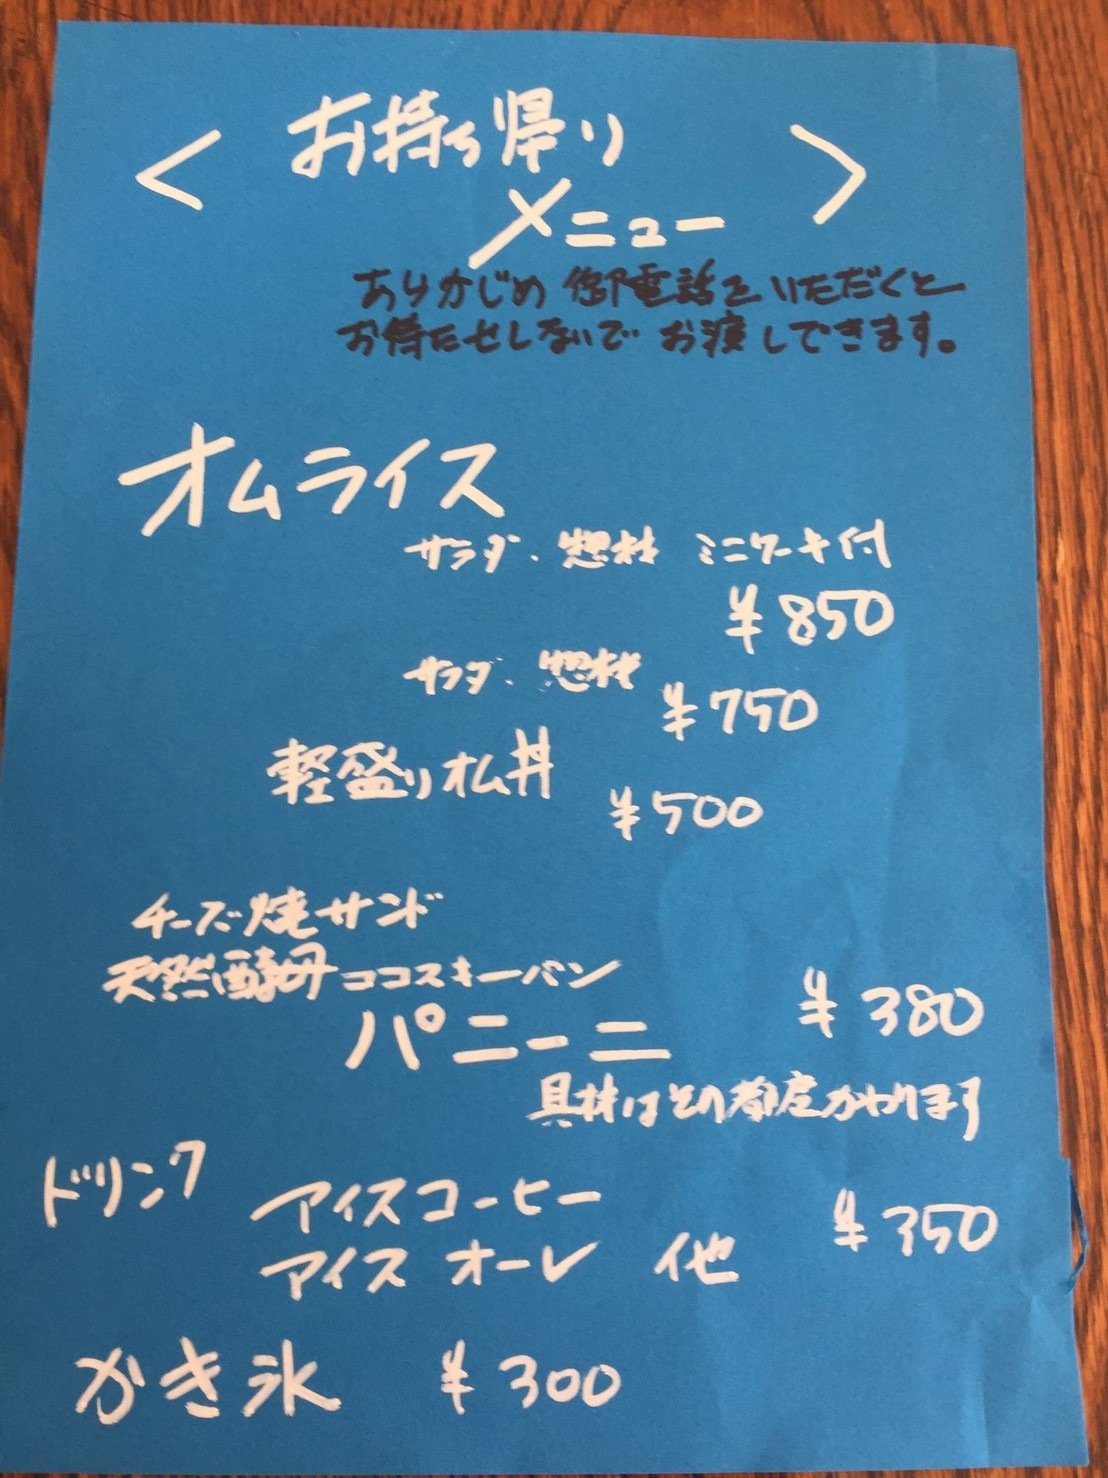 Tottori カルマ  カルマ焼飯_e0115904_22253781.jpg